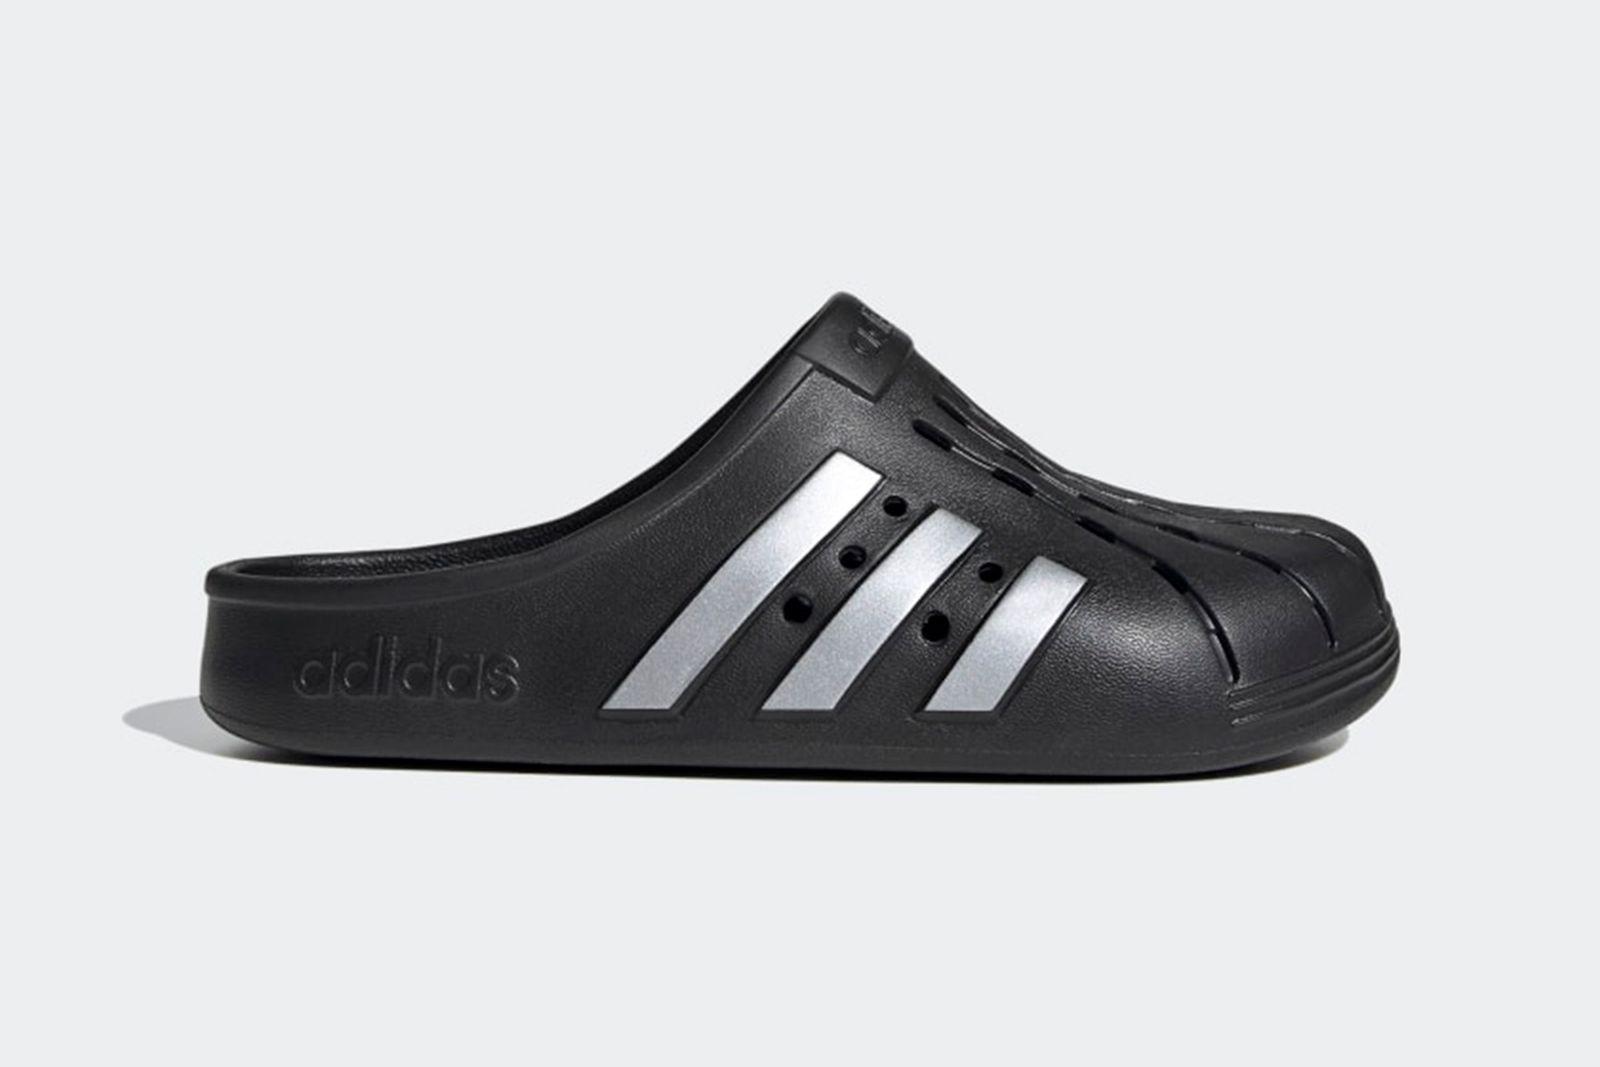 adidas-adilette-clog-release-date-price-01